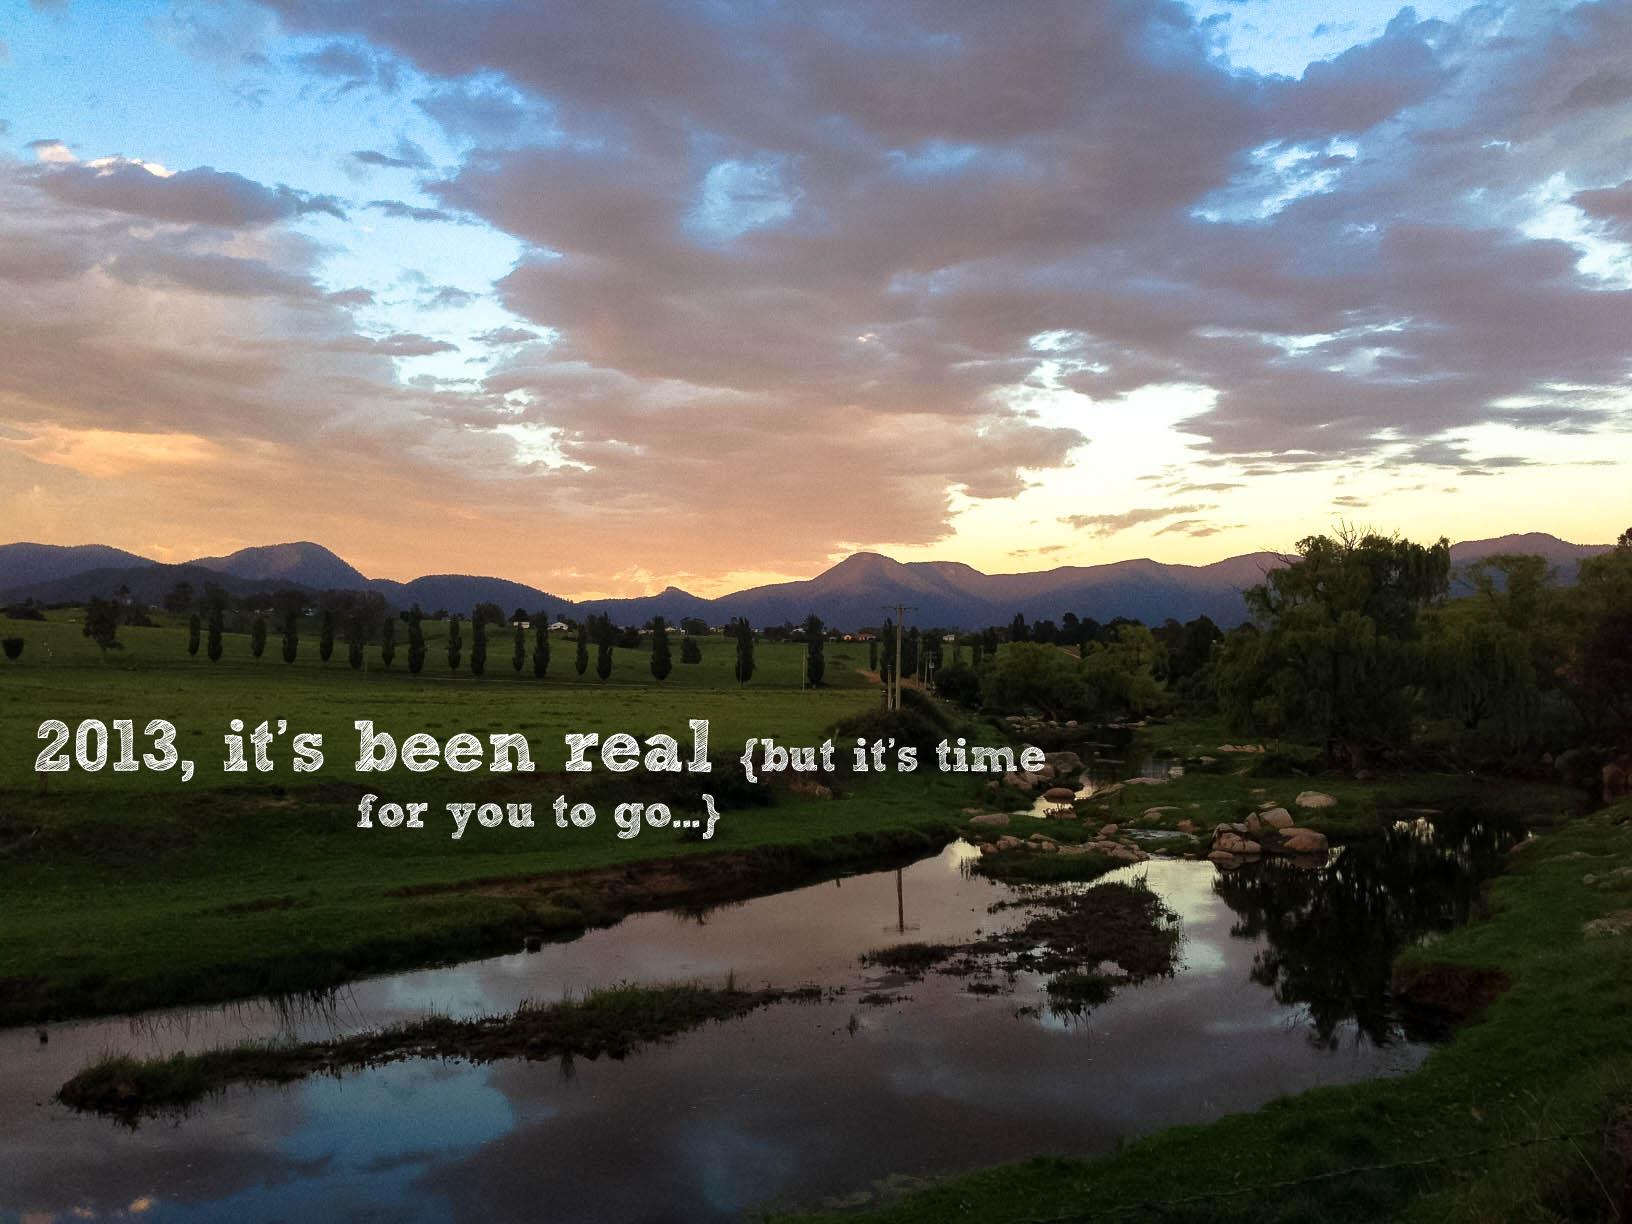 2013 it's been real || rebeccashann.com